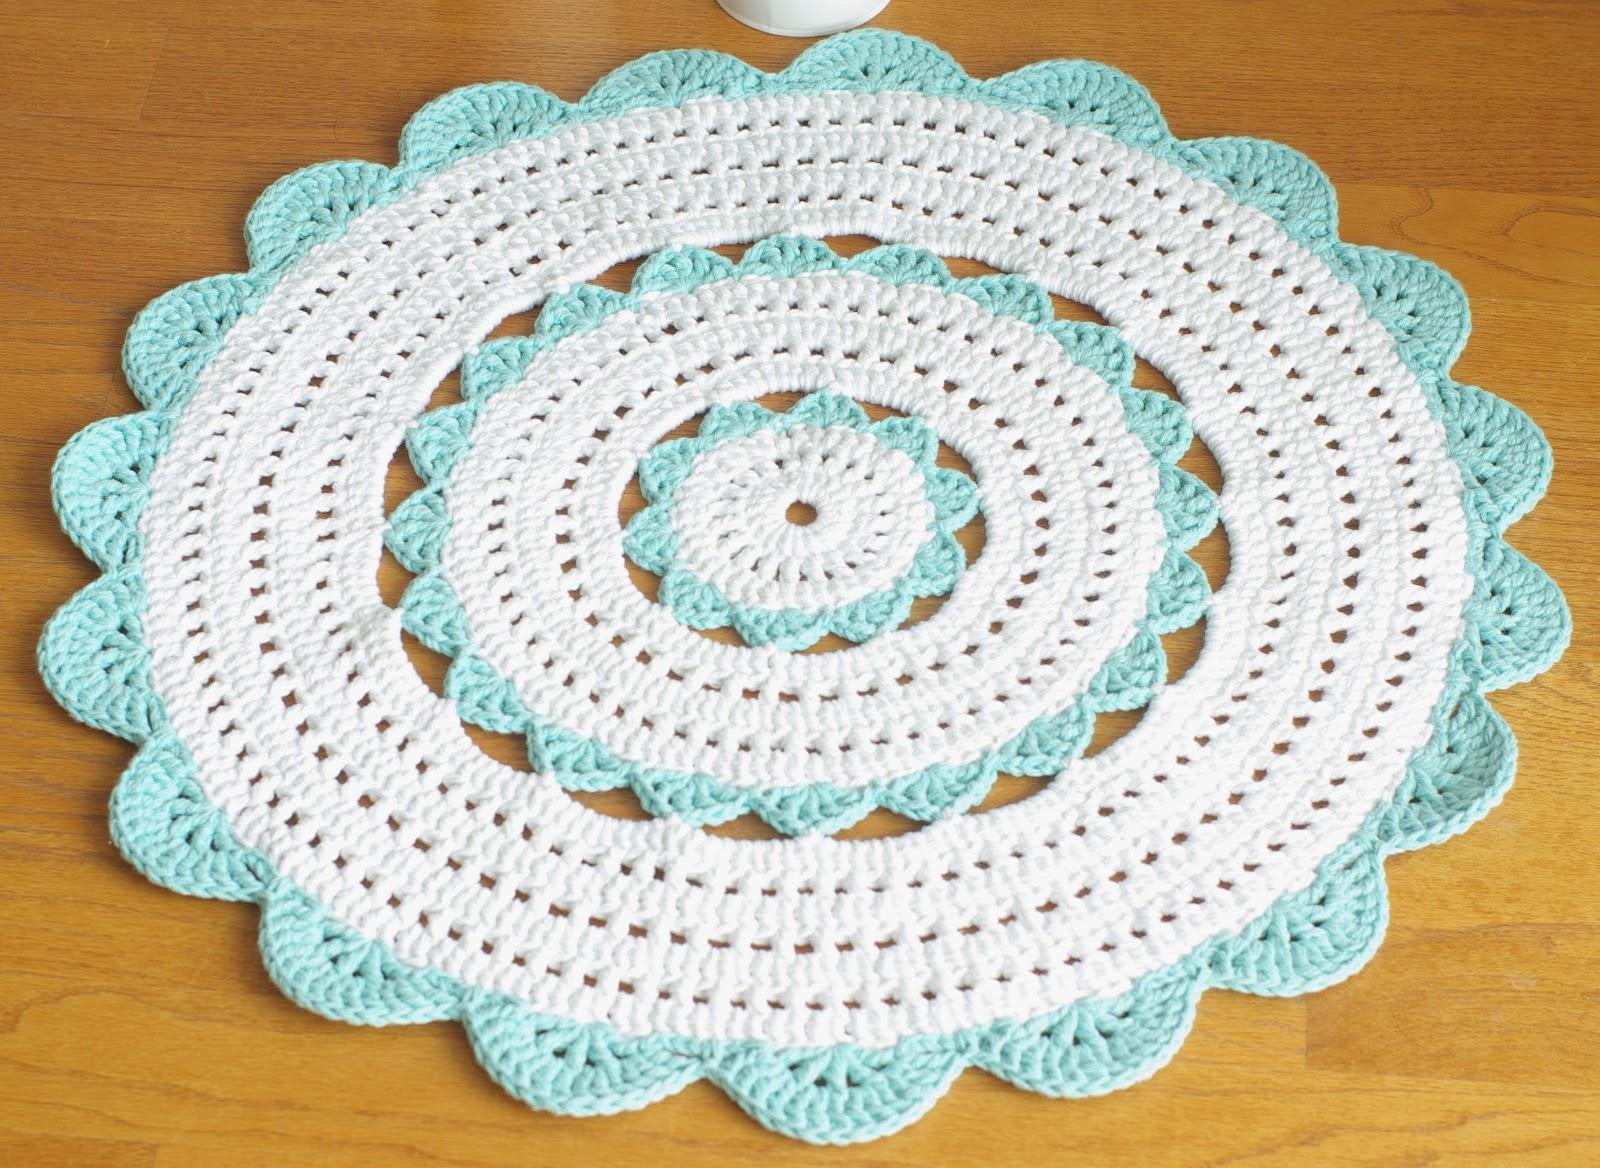 Custom Handmade Crochet Doily Rug Sara